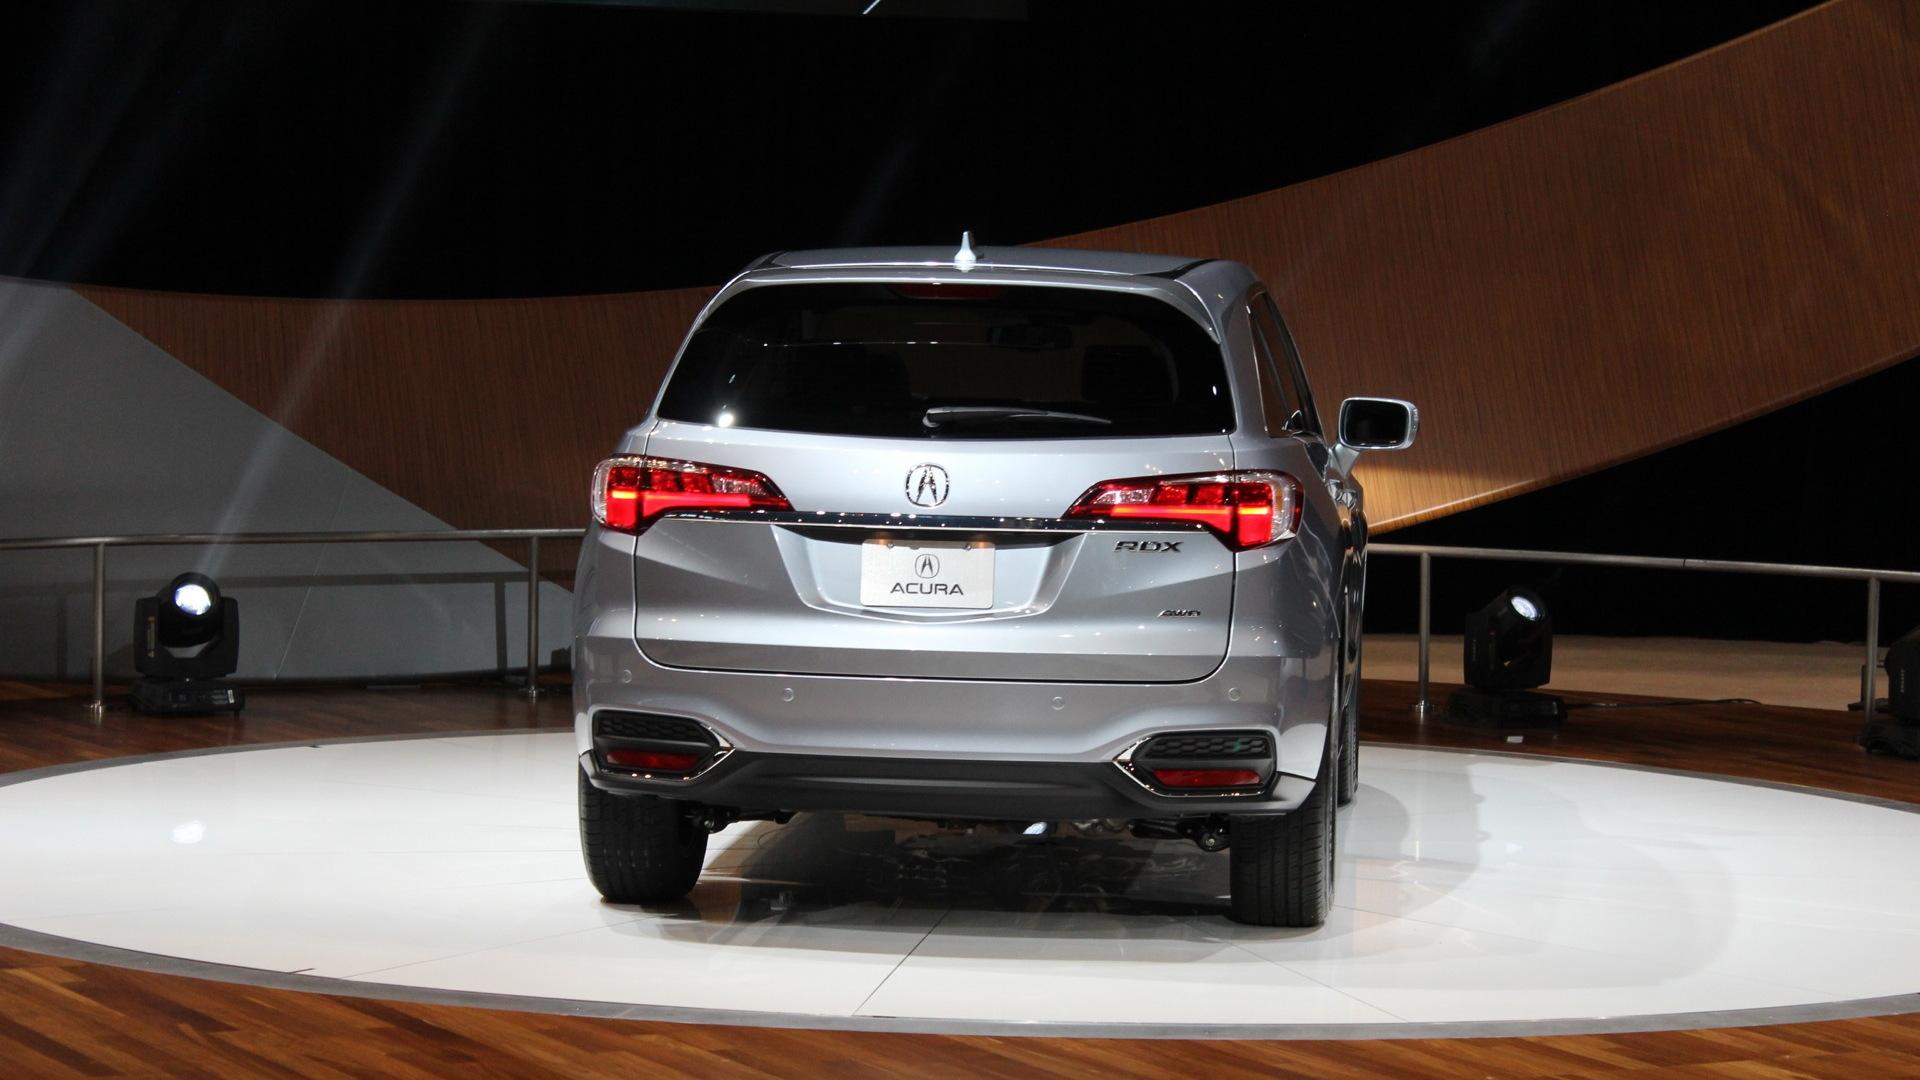 2016 Acura Rdx Debuts At 2015 Chicago Auto Show Live Photos